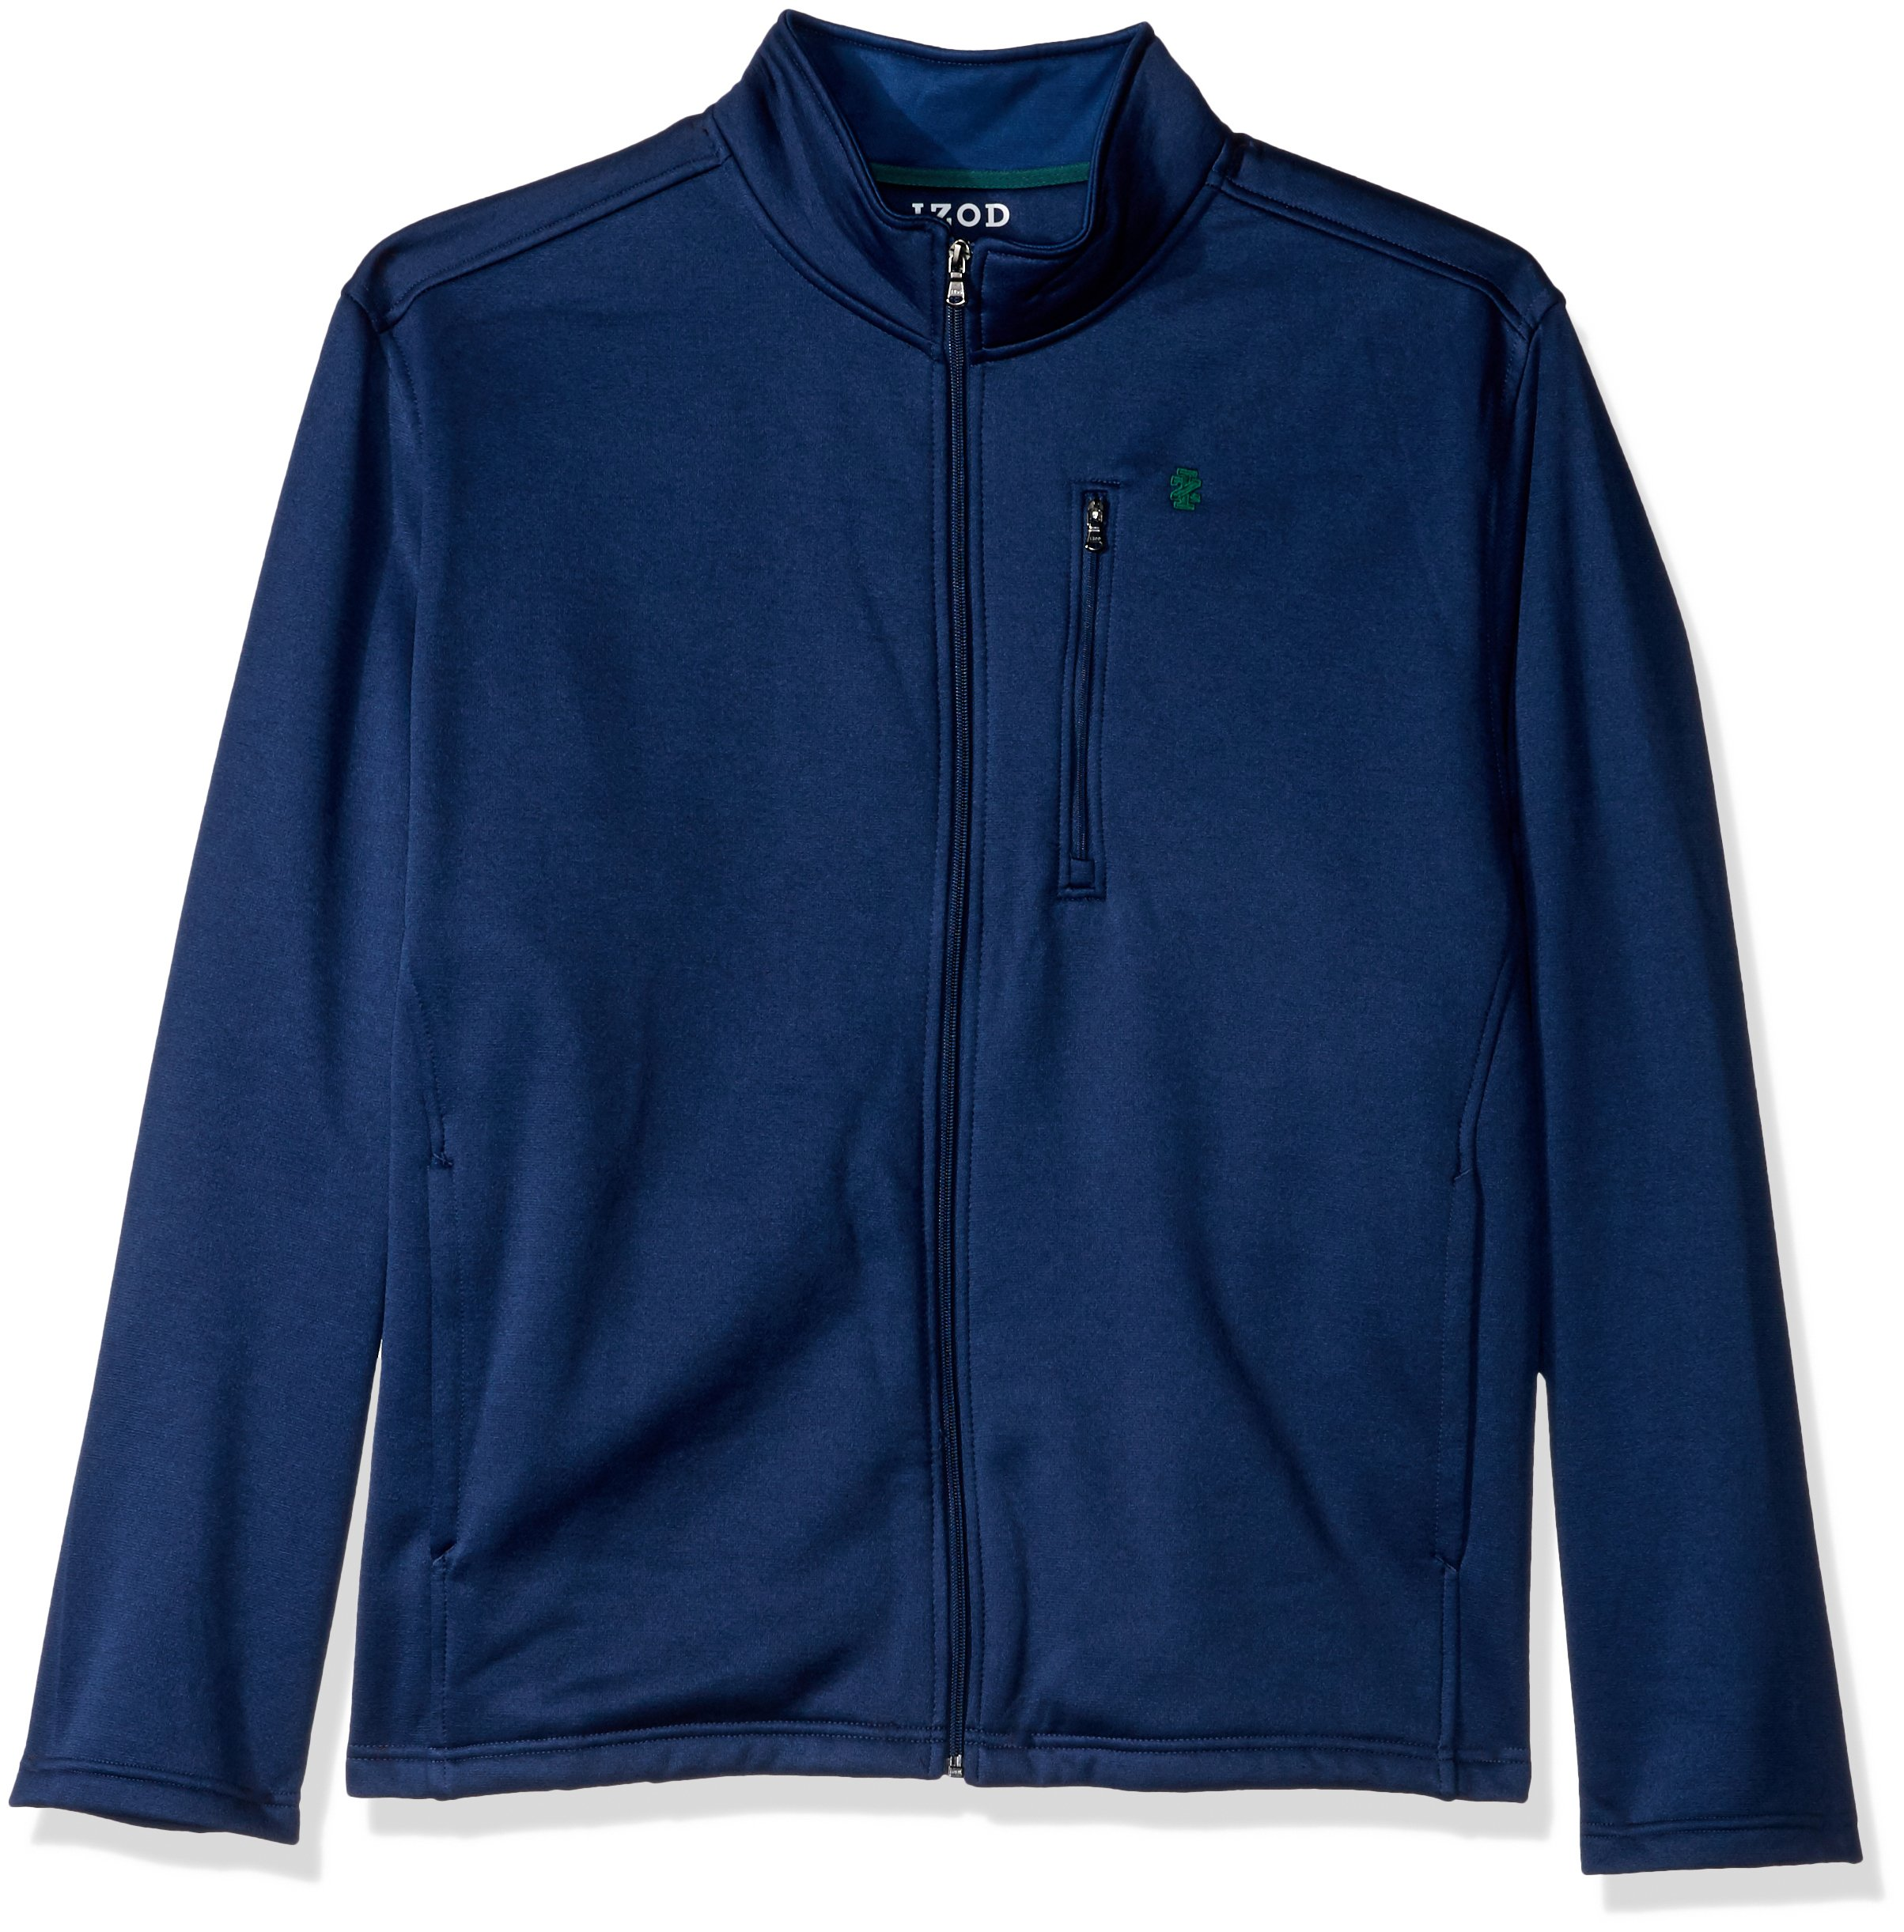 IZOD Men's Big and Tall Spectator Solid Fleece Jacket, Estate Blue Heather, 2X-Large Big